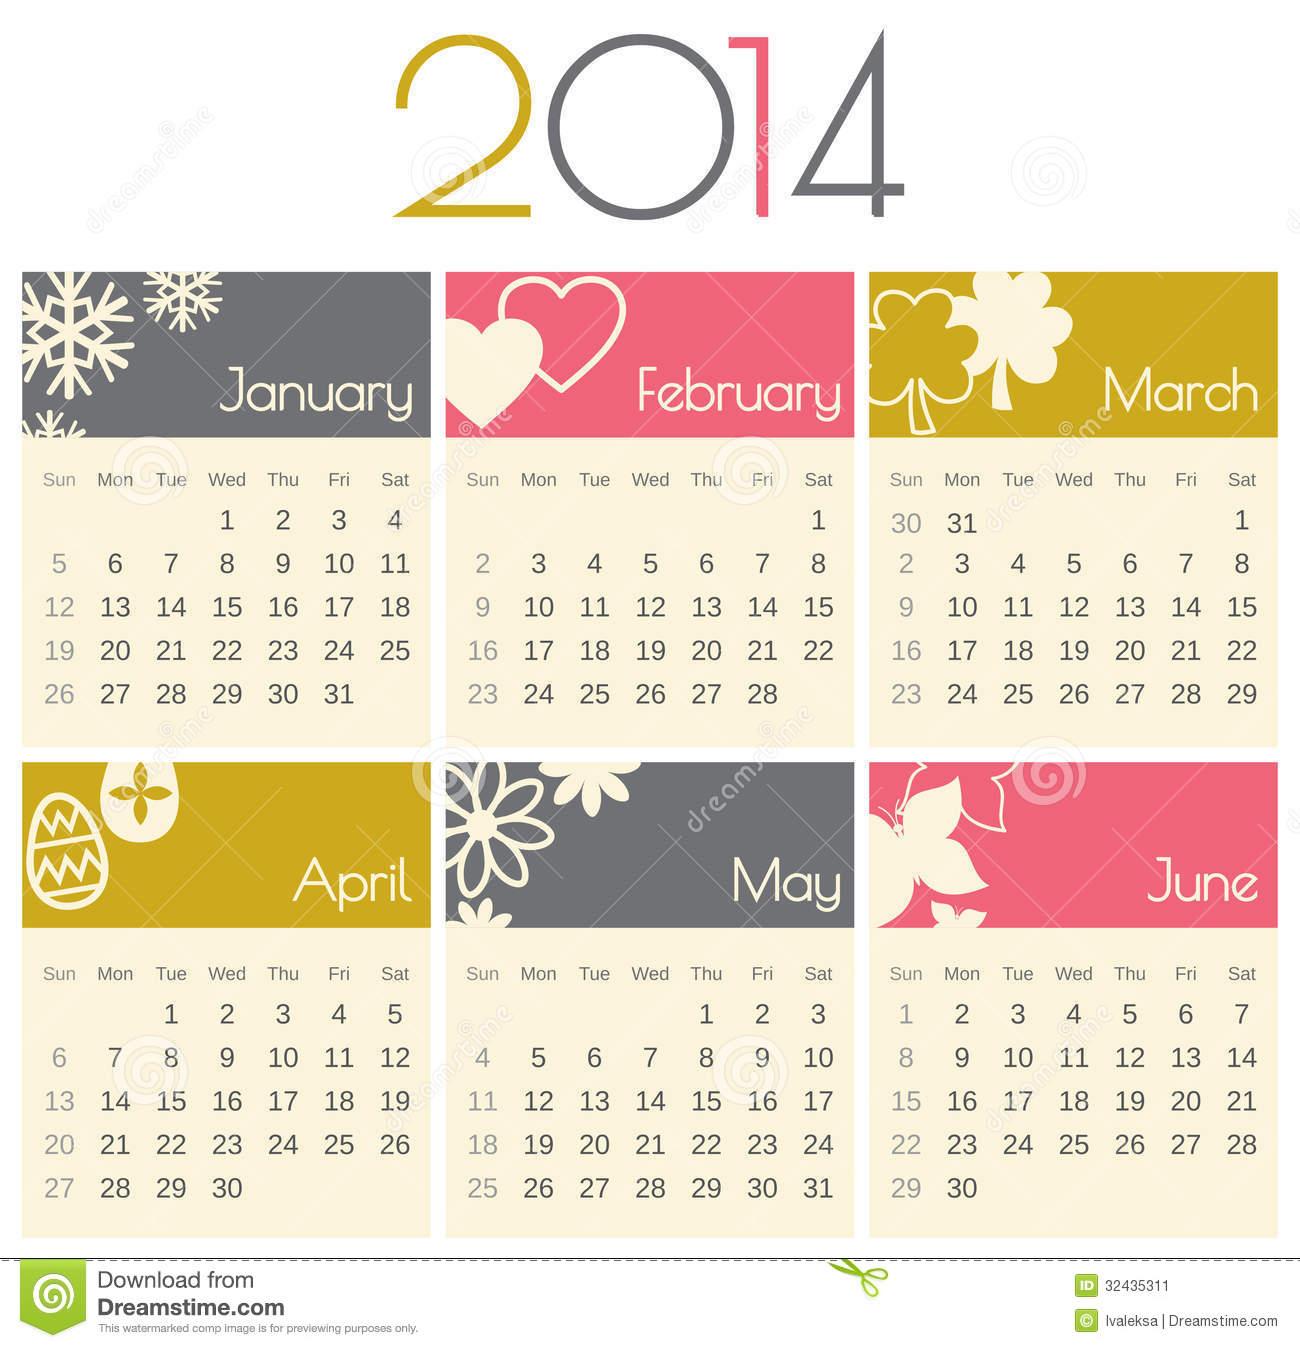 January 2014 calendar clipart jpg transparent stock 2014 Calendar Clipart - Clipart Kid jpg transparent stock